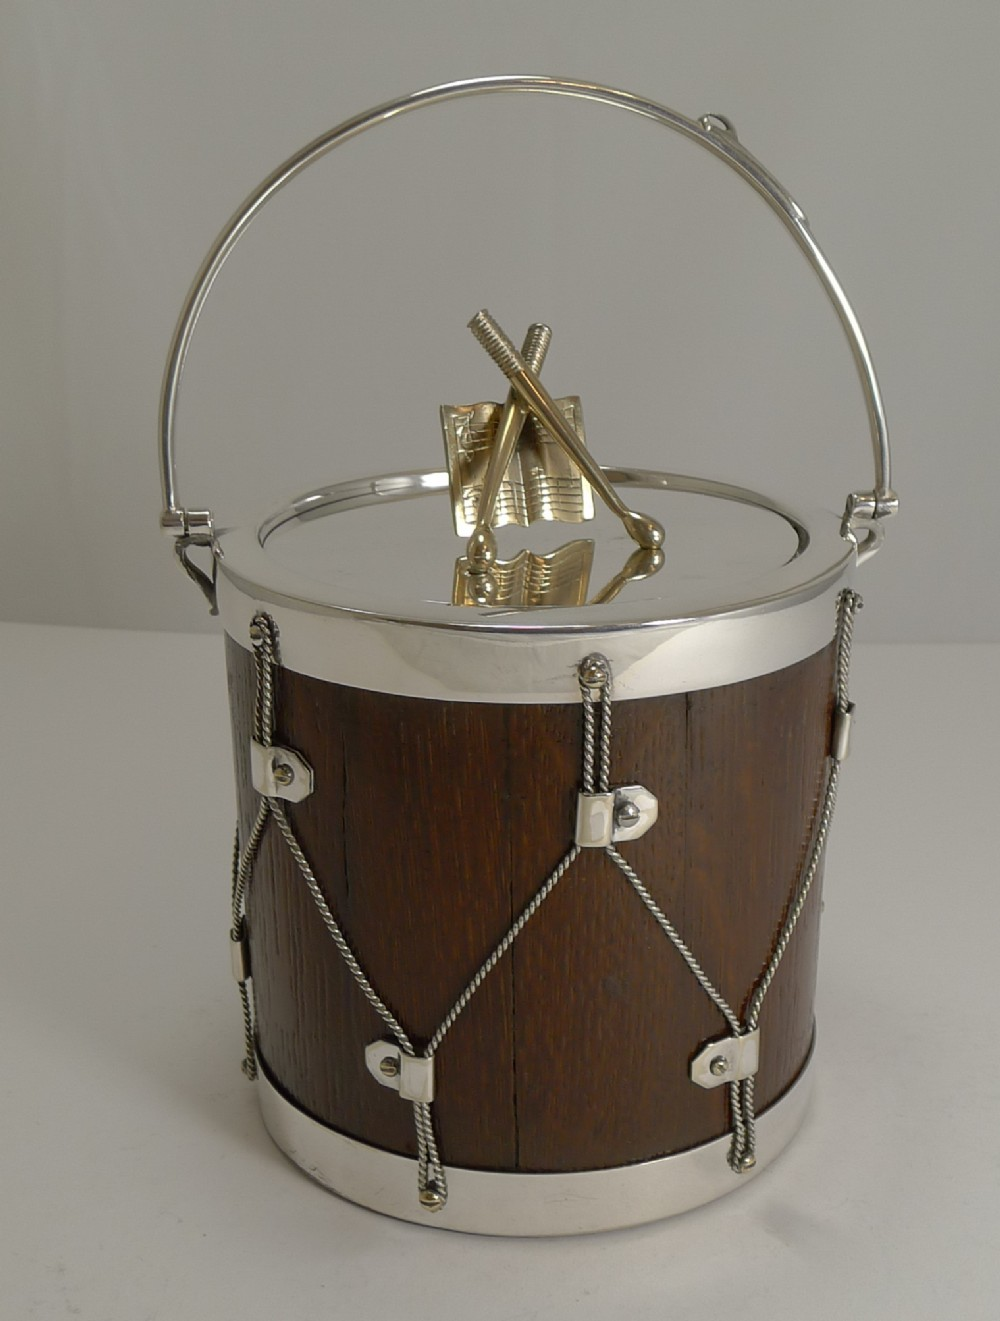 fabulous antique english oak silver plated drum form biscuit box barrel c1890